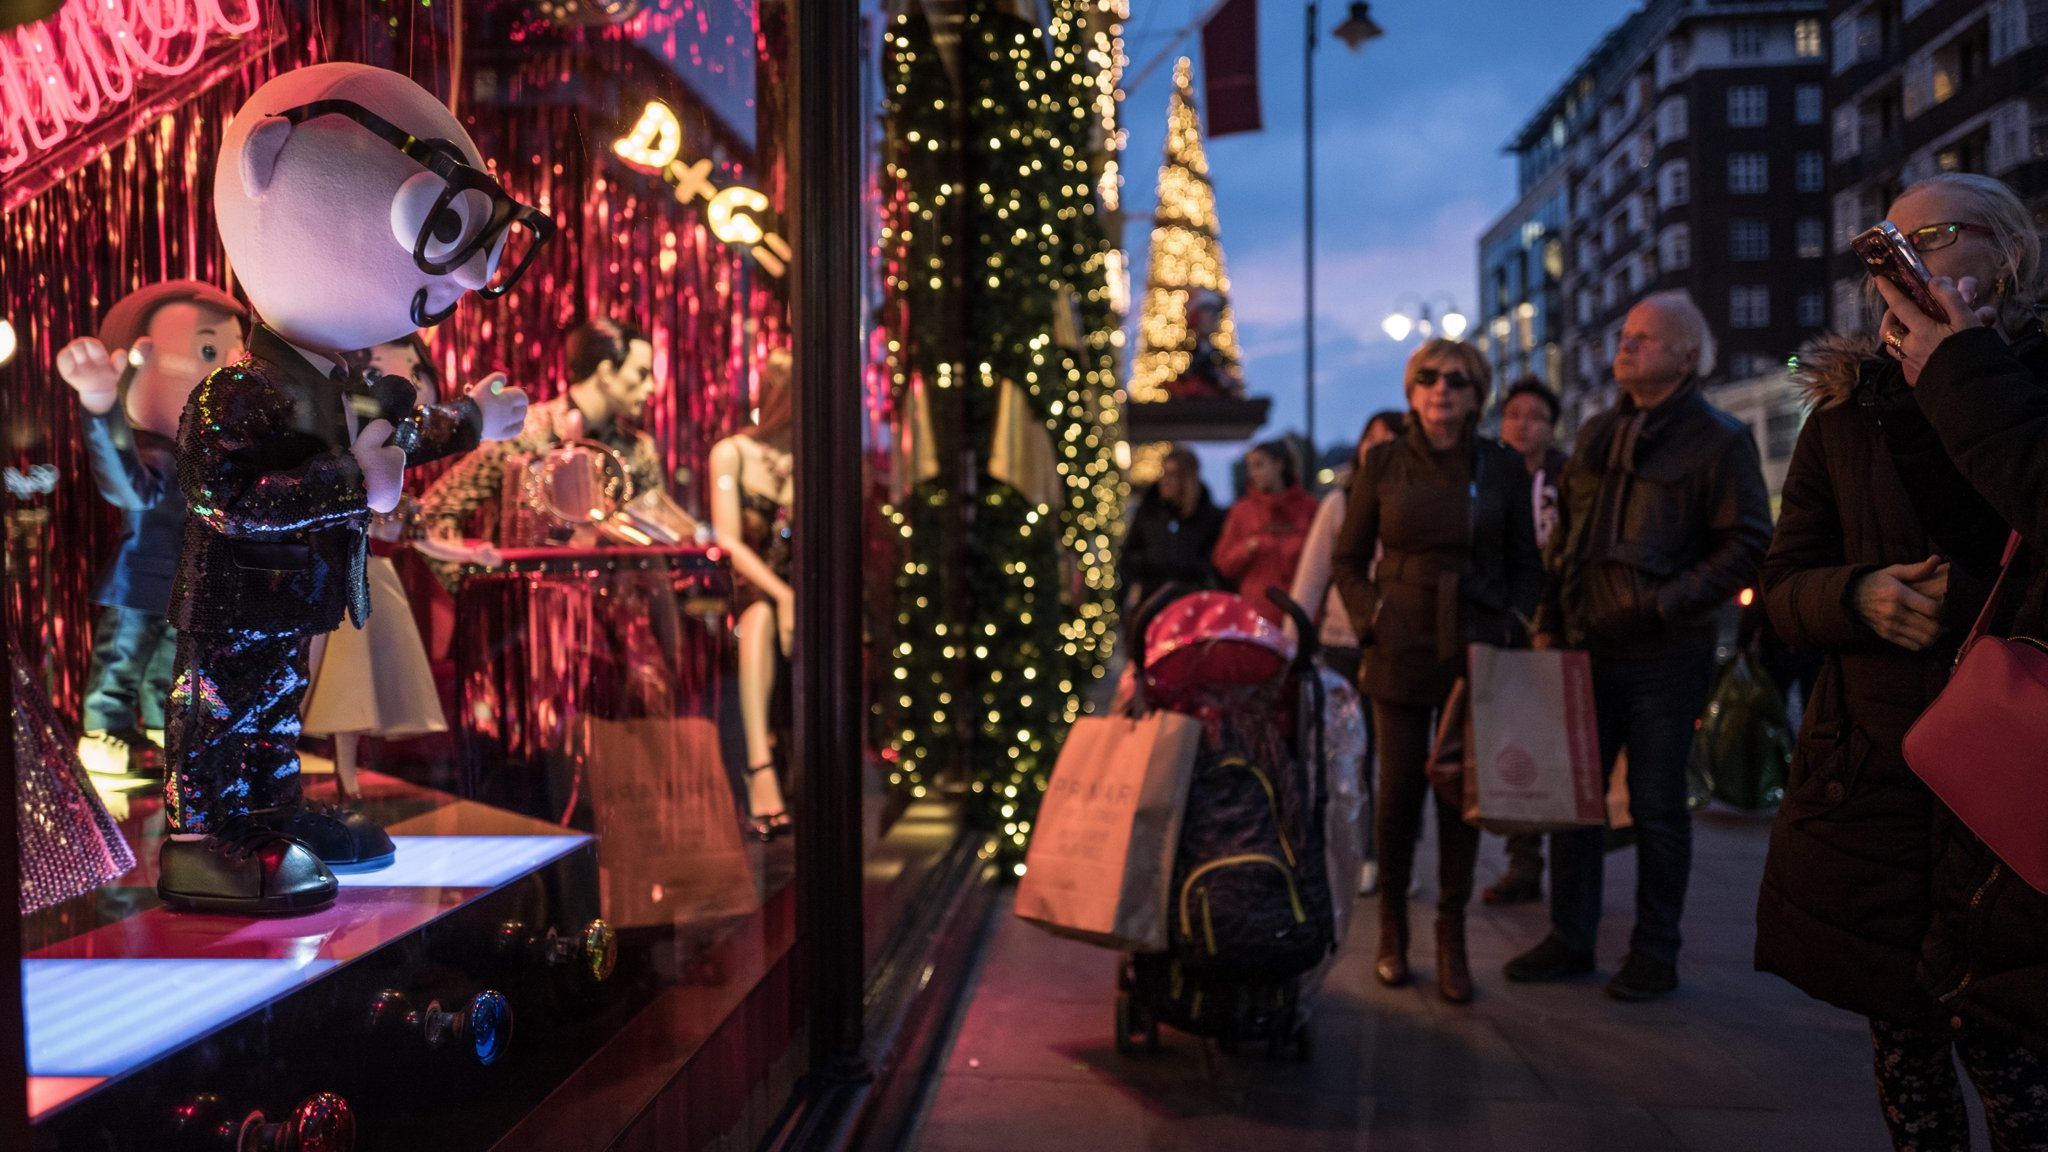 Dolce And Gabbana -Spring 2020 -Love Christmas Dolce & Gabbana takes over Harrods' festive shop windows